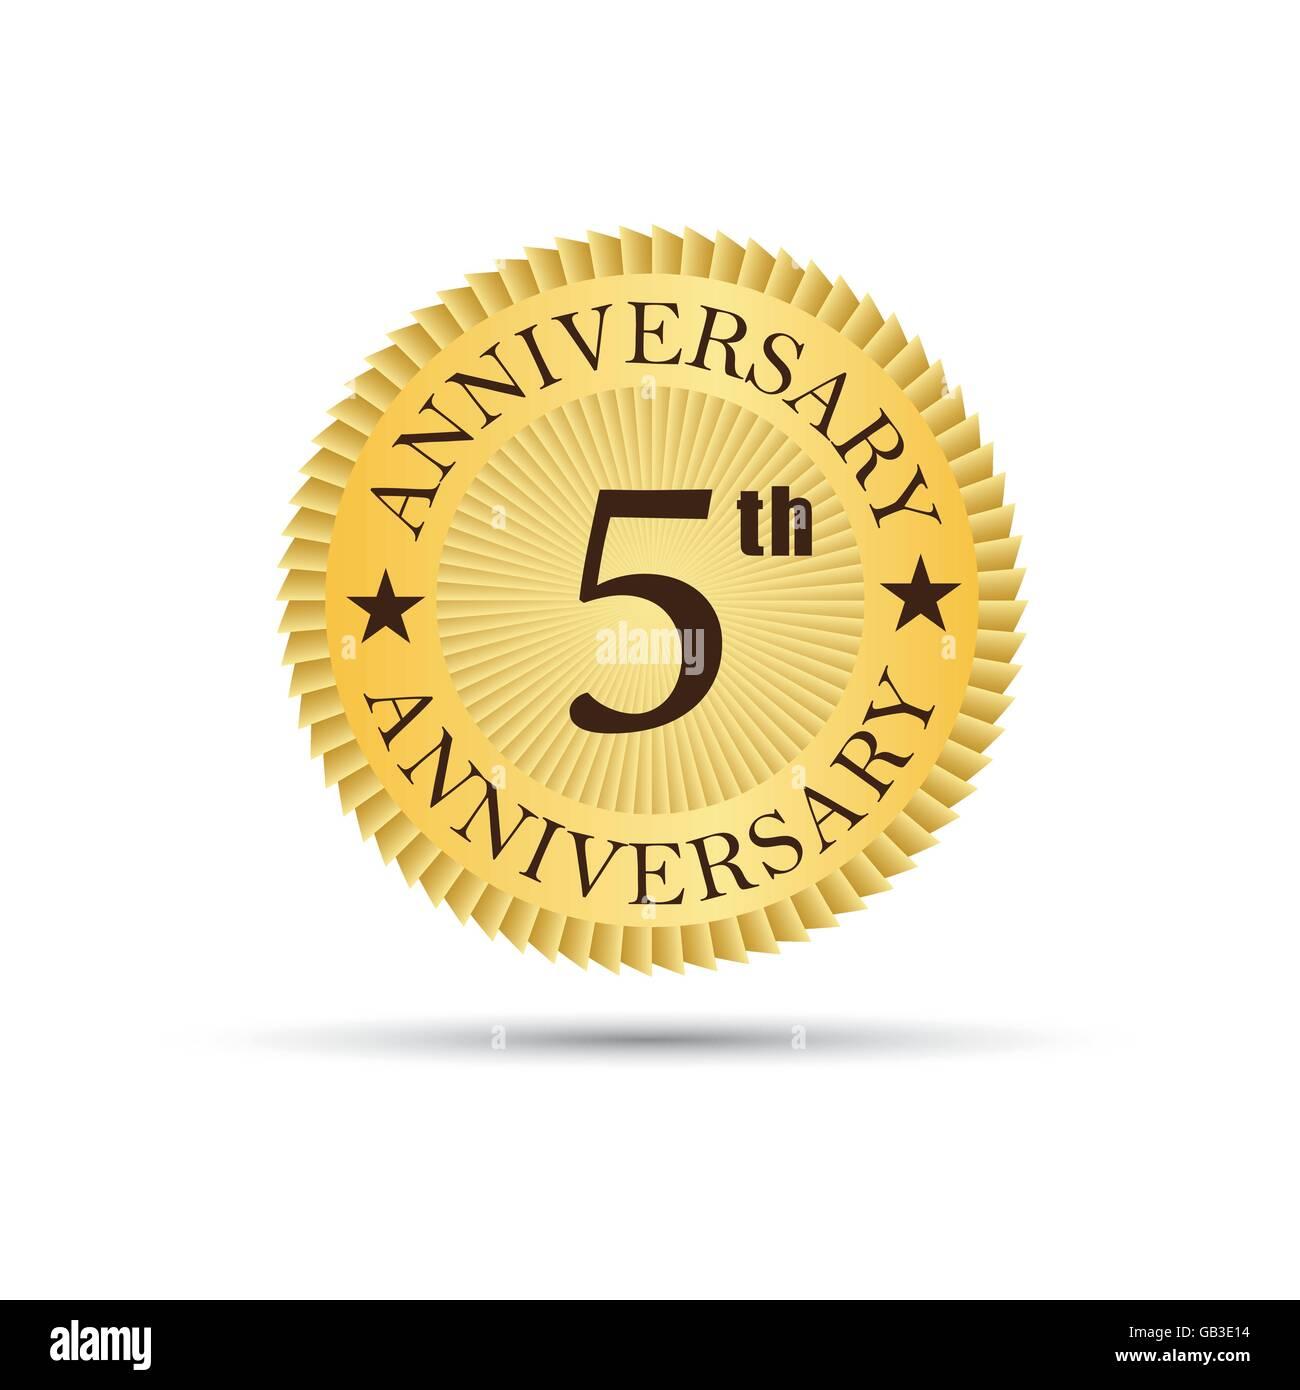 Golden label badge 5 years anniversary logo - Stock Image